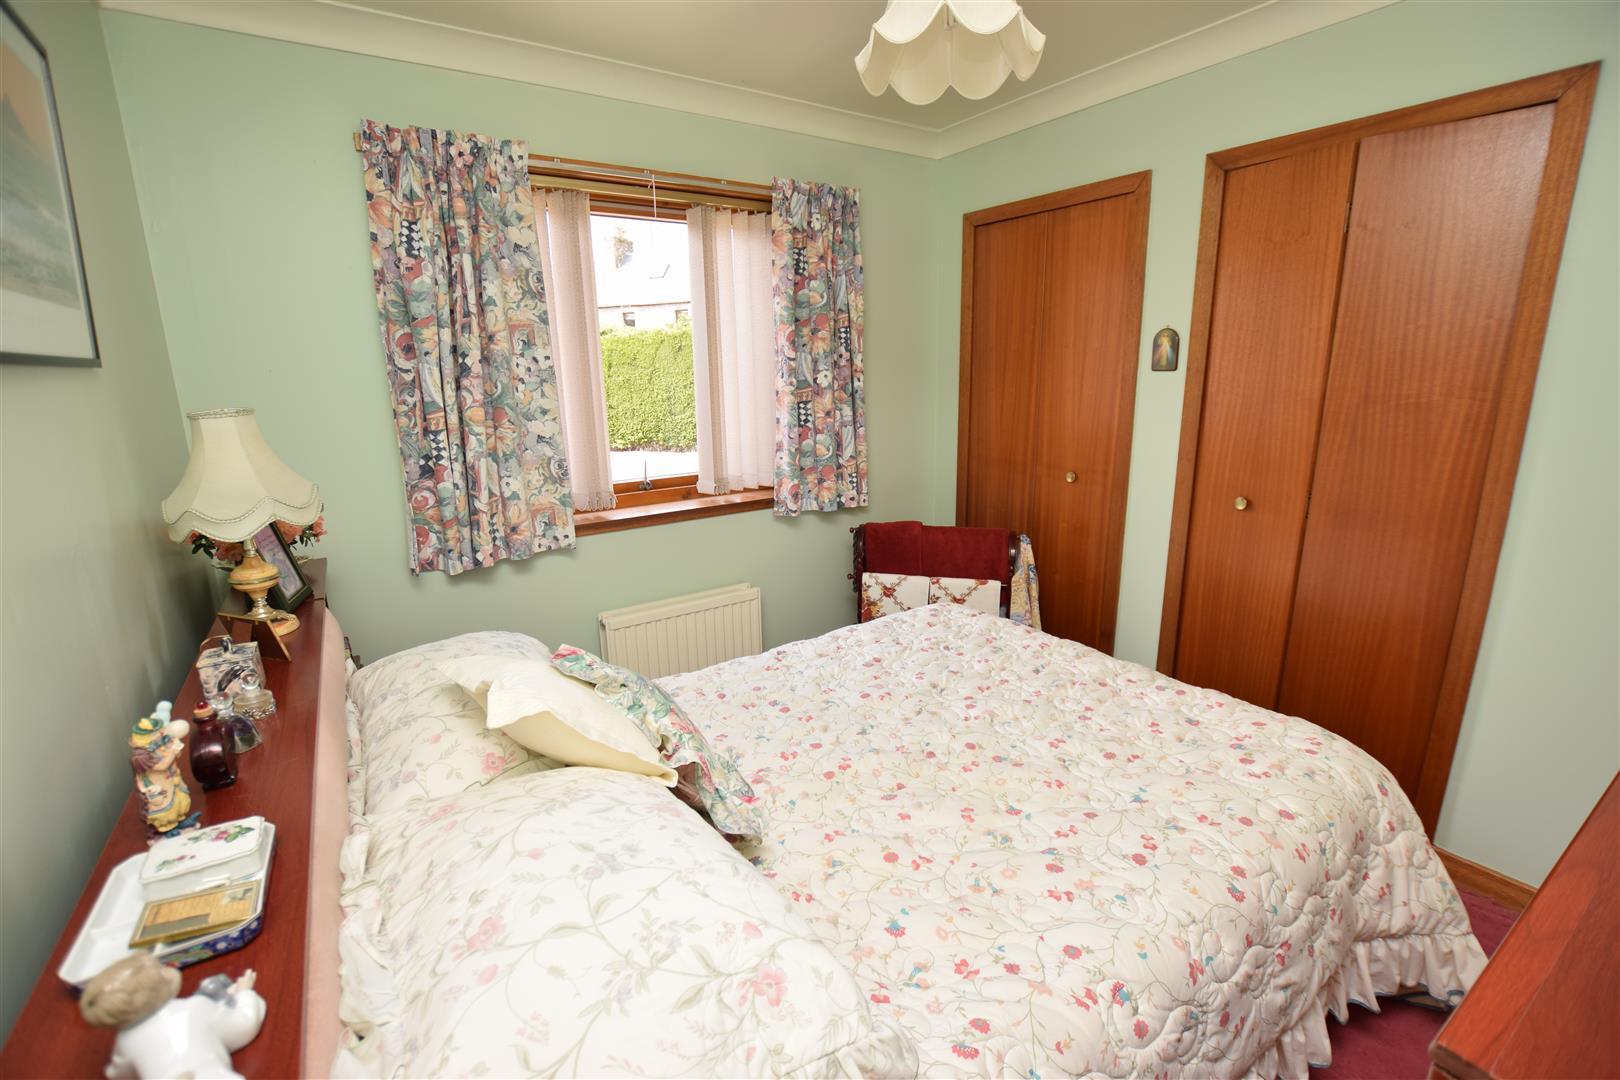 23, Ochil Gardens, Dunning, Perthshire, PH2 0SR, UK